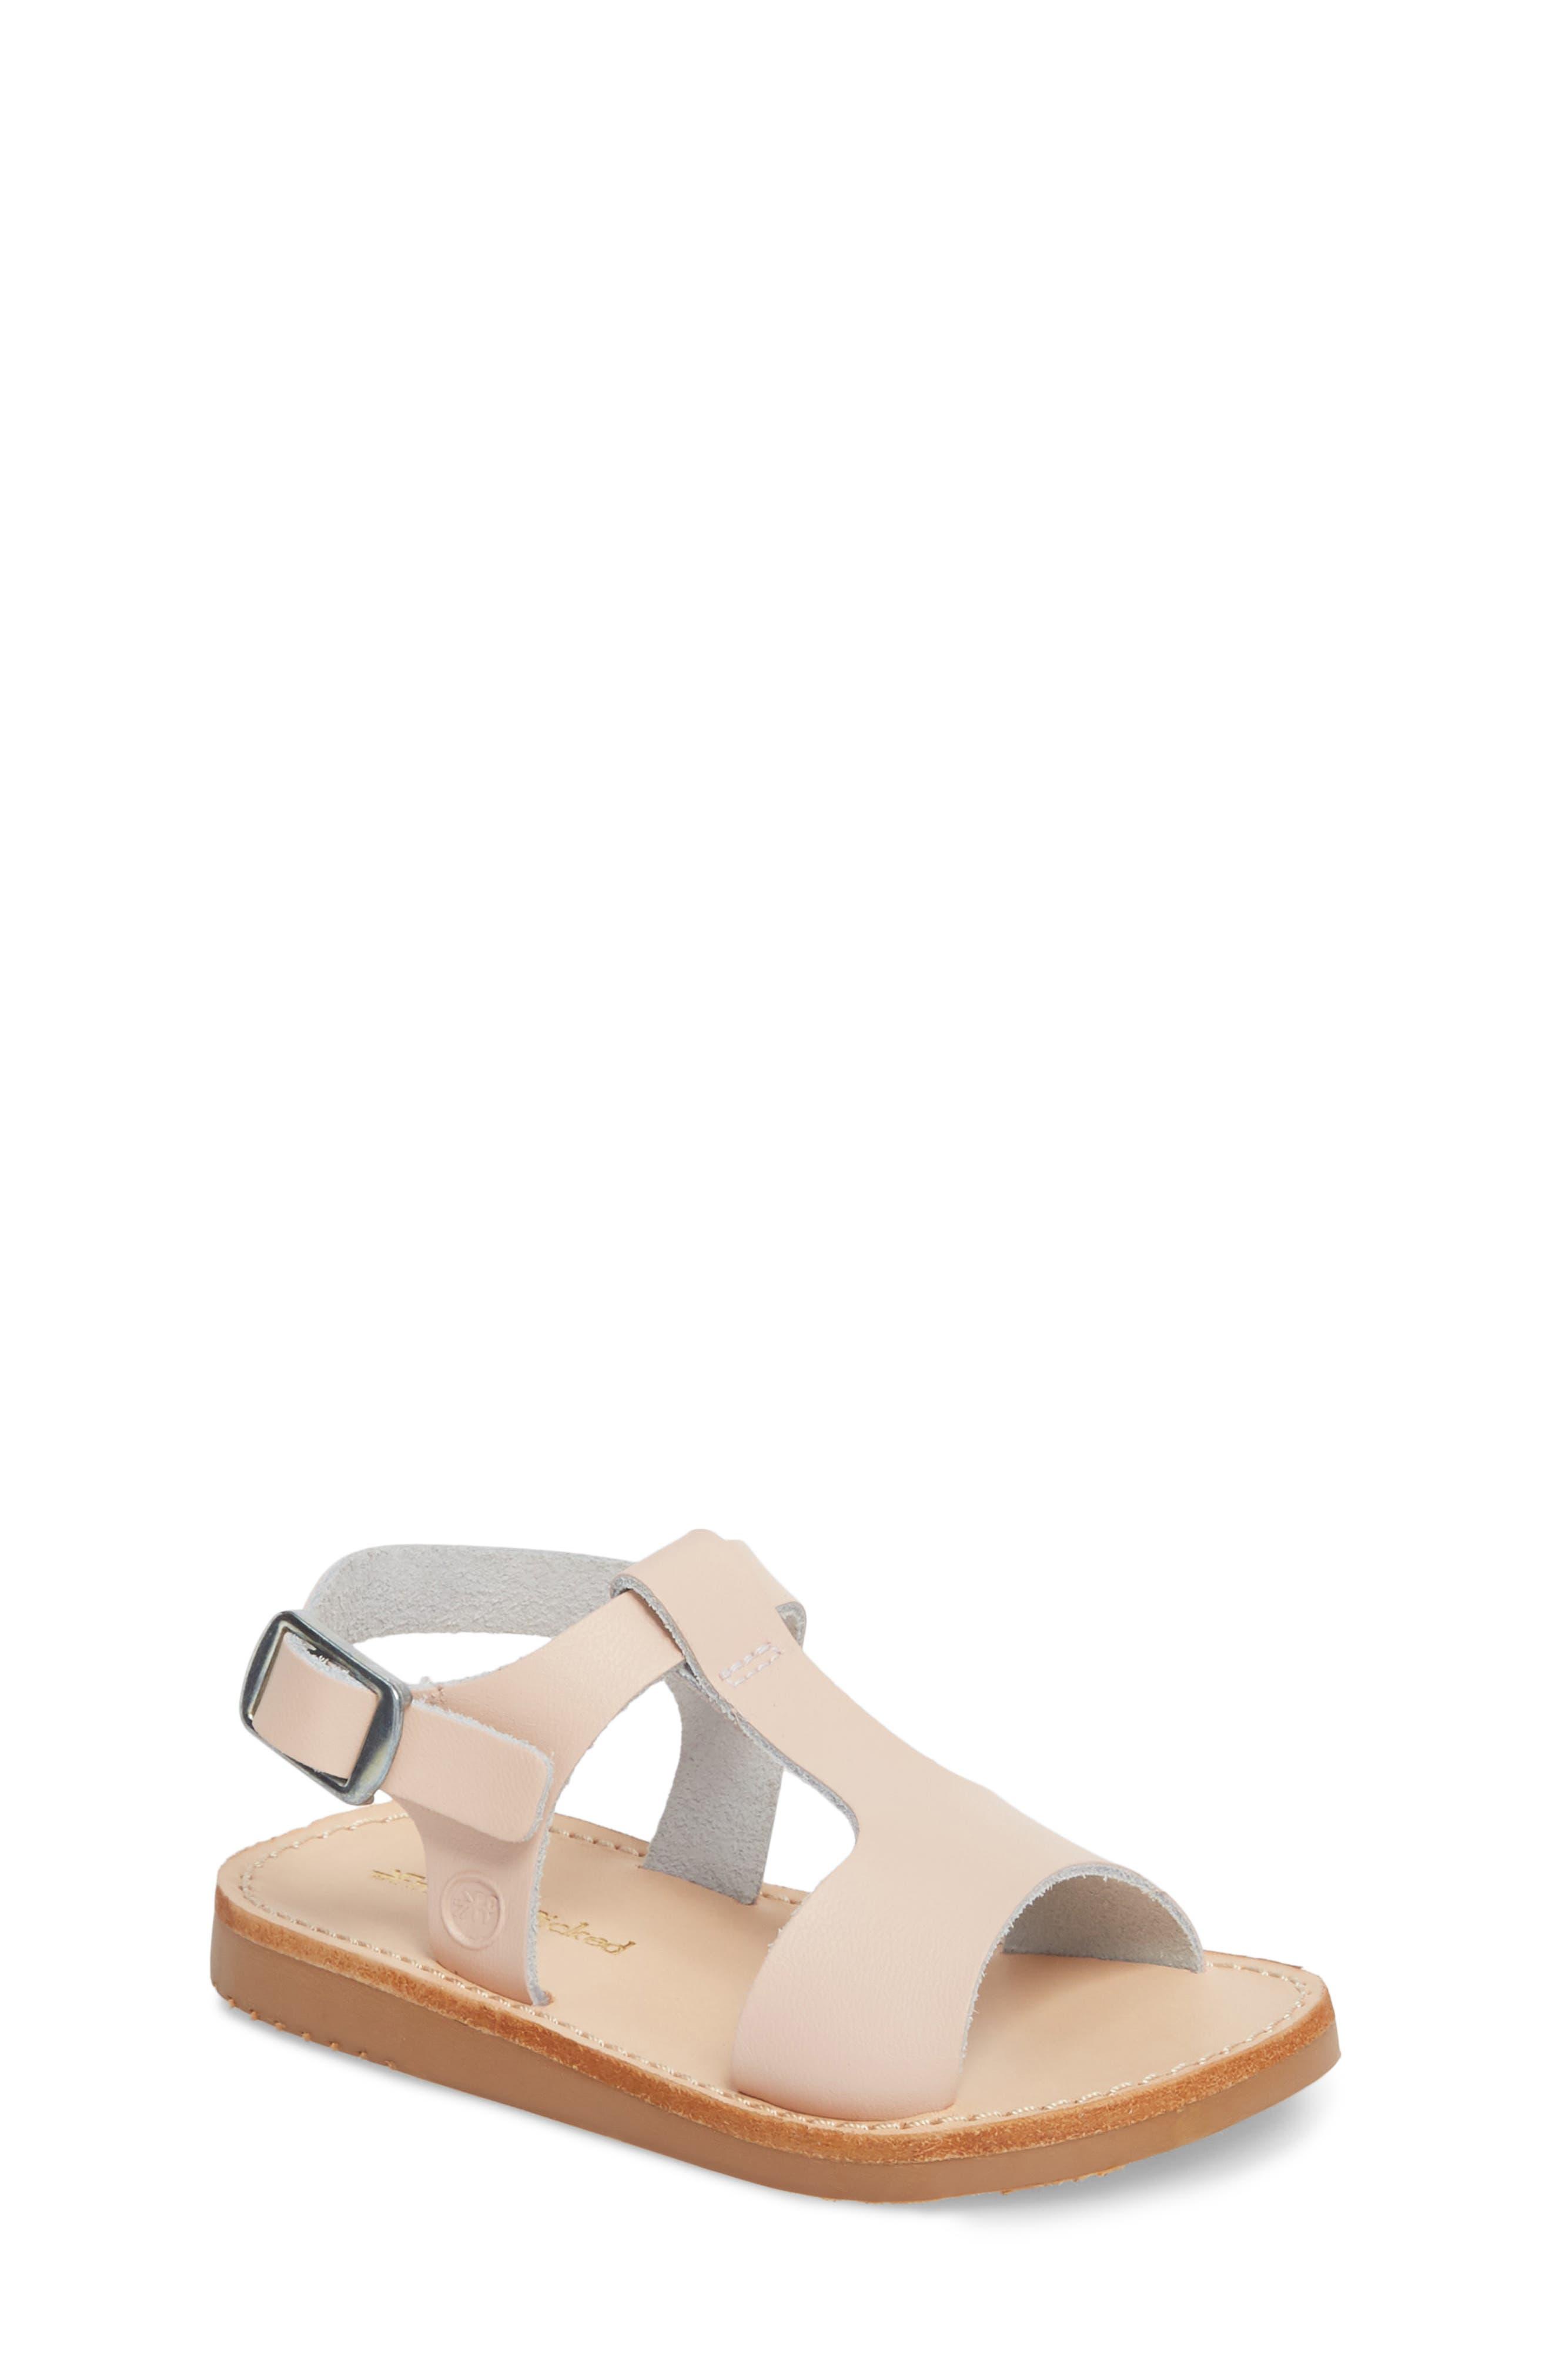 Malibu Water Resistant Sandal,                         Main,                         color, Blush